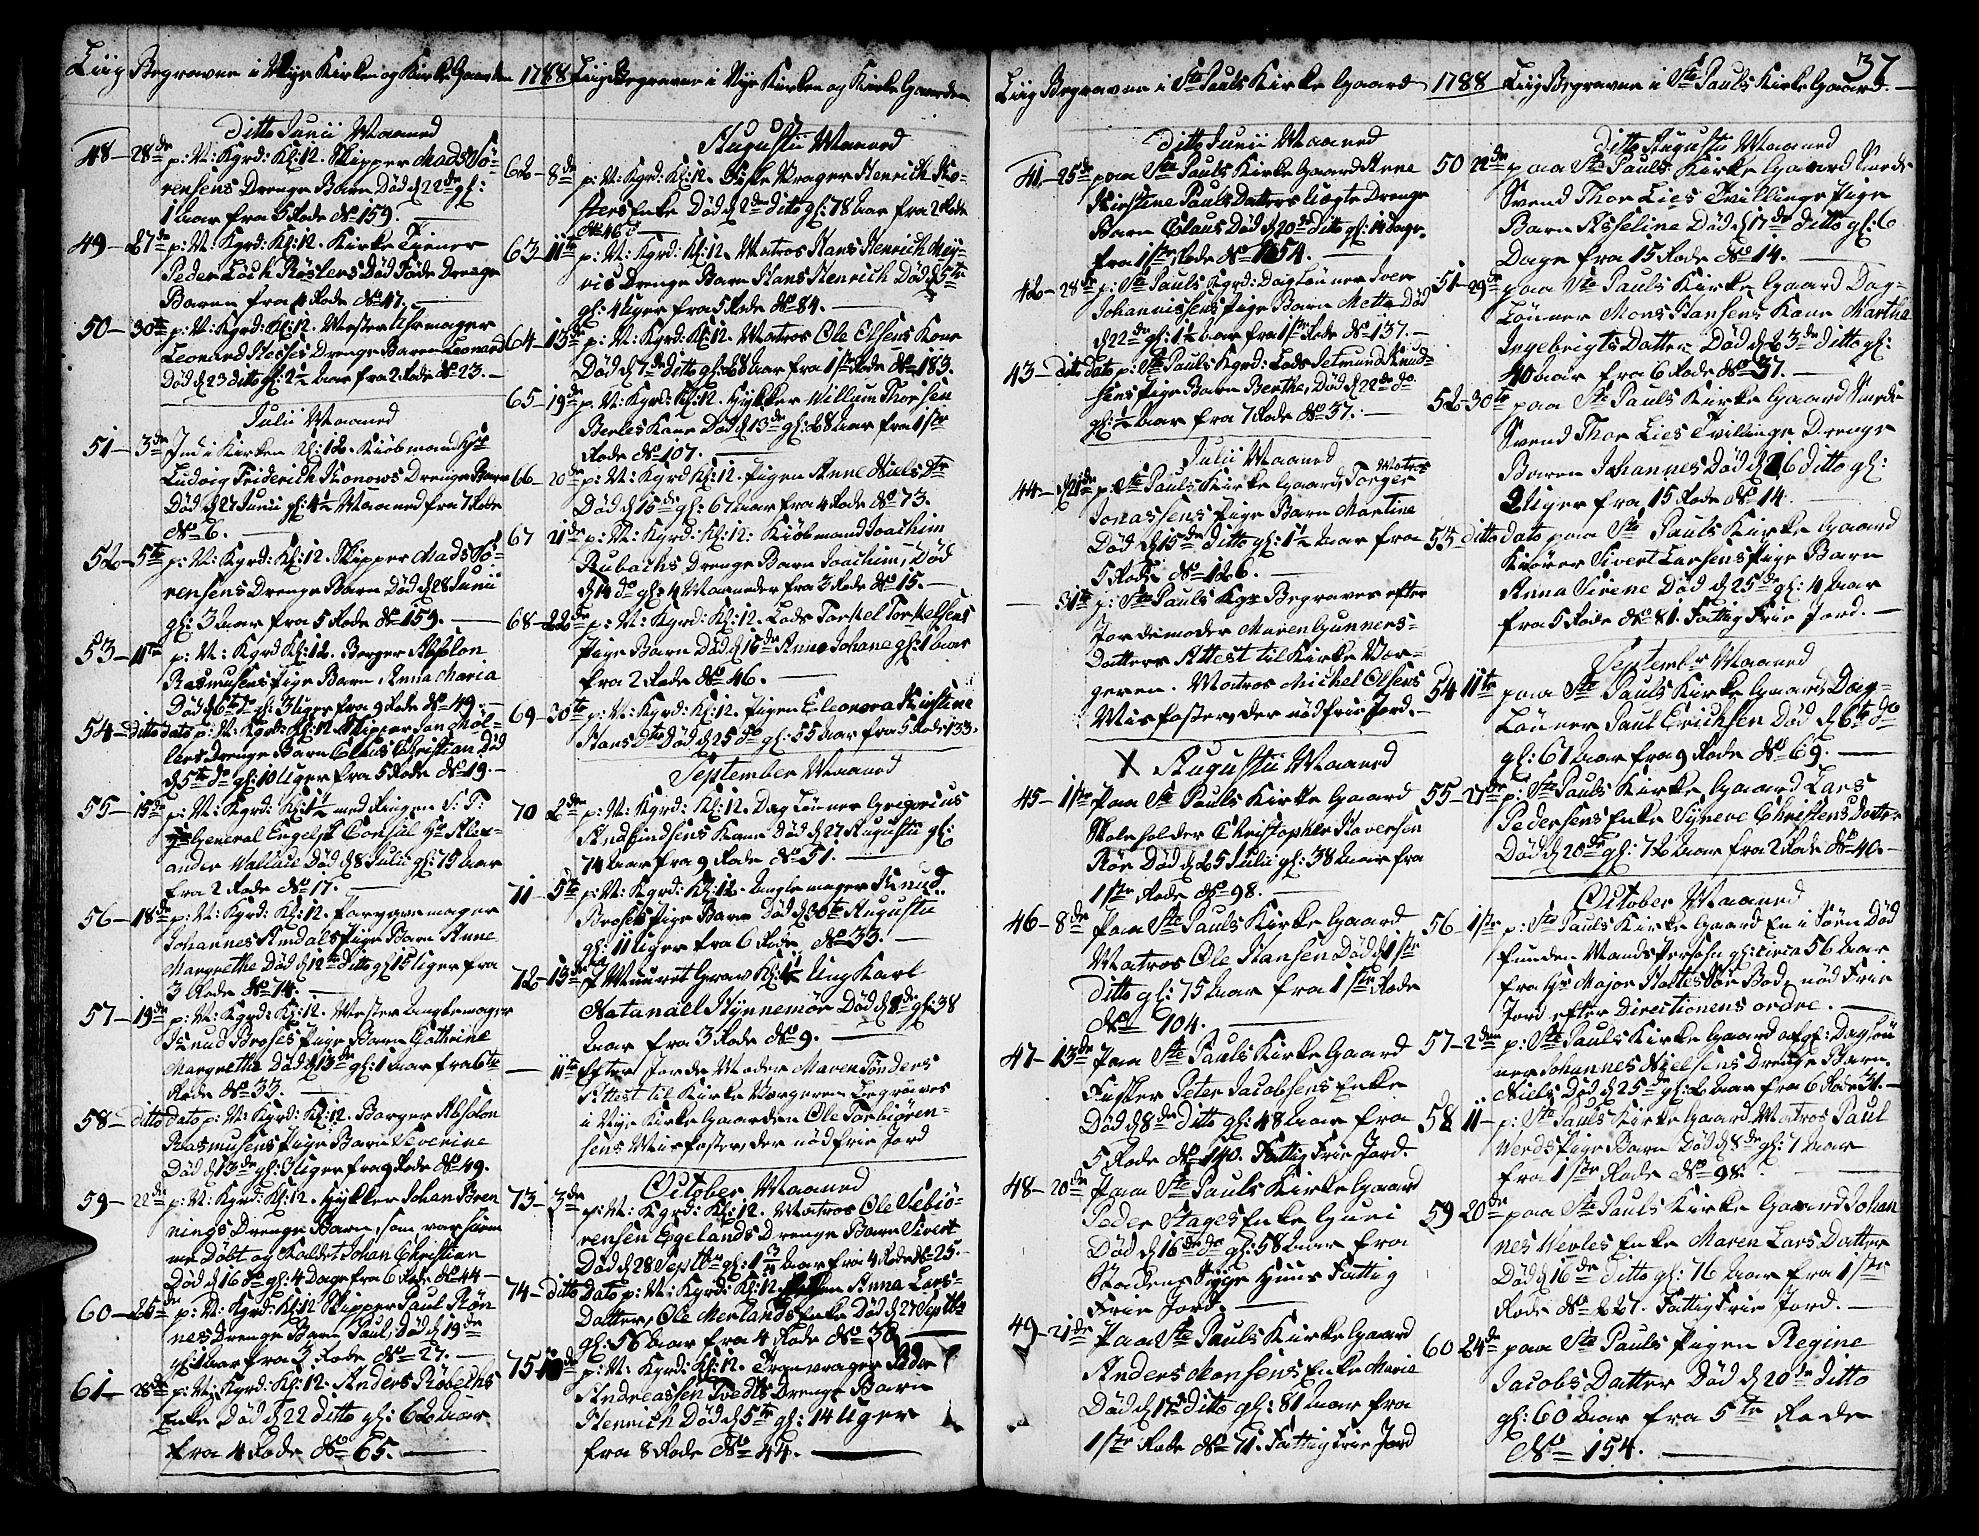 SAB, Nykirken Sokneprestembete, H/Hab: Parish register (copy) no. A 3, 1775-1820, p. 37